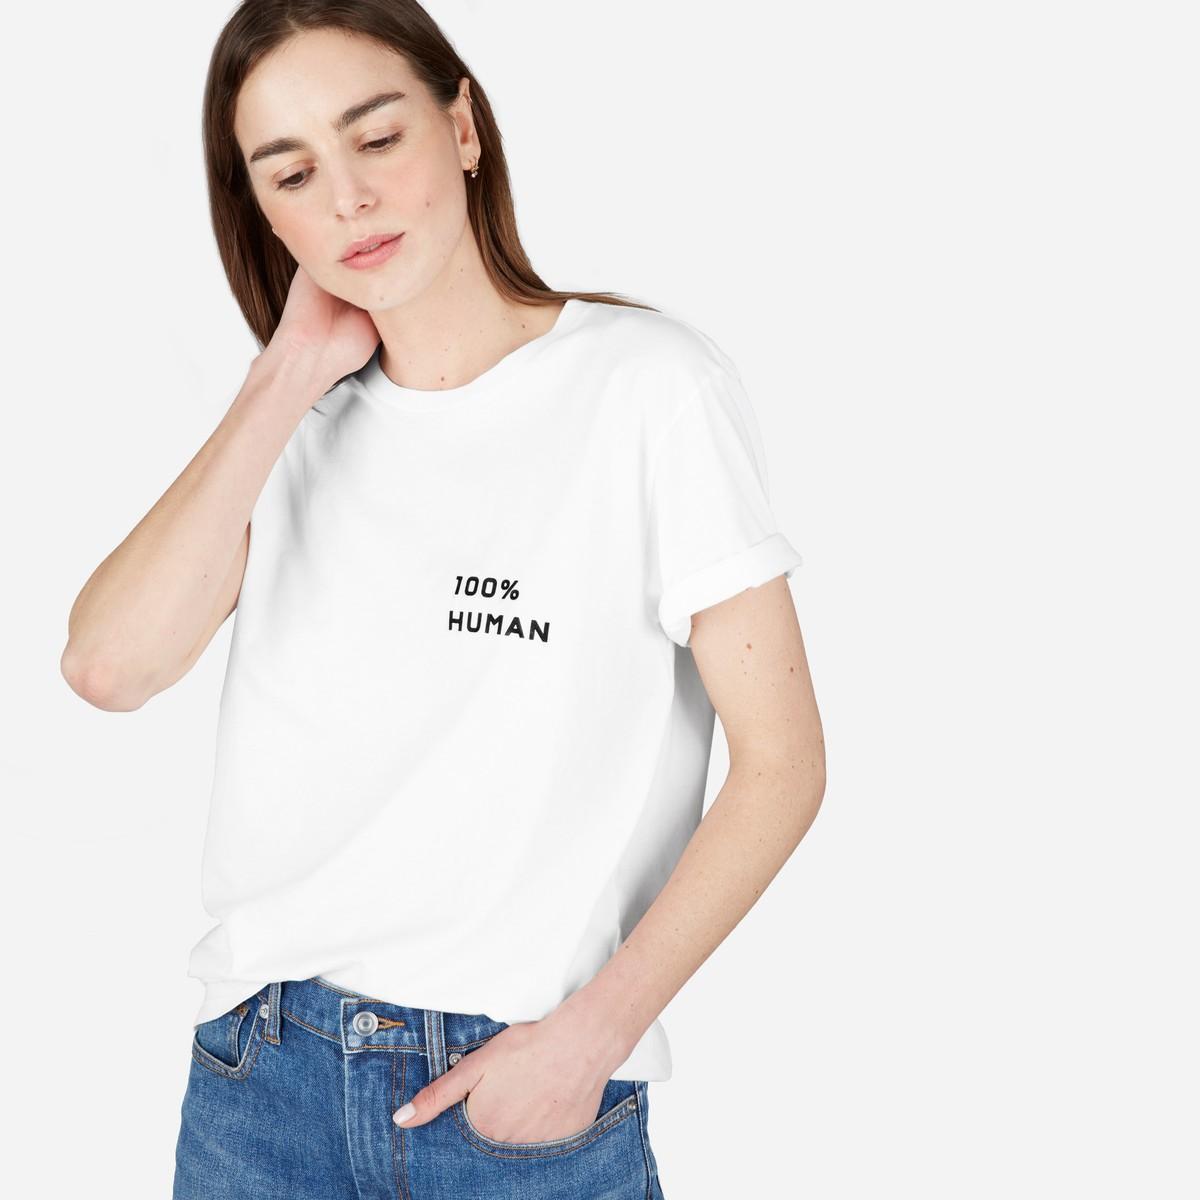 Everlane 100% Human 小标箱型女士宽松 t恤学生字母印花纯棉短袖